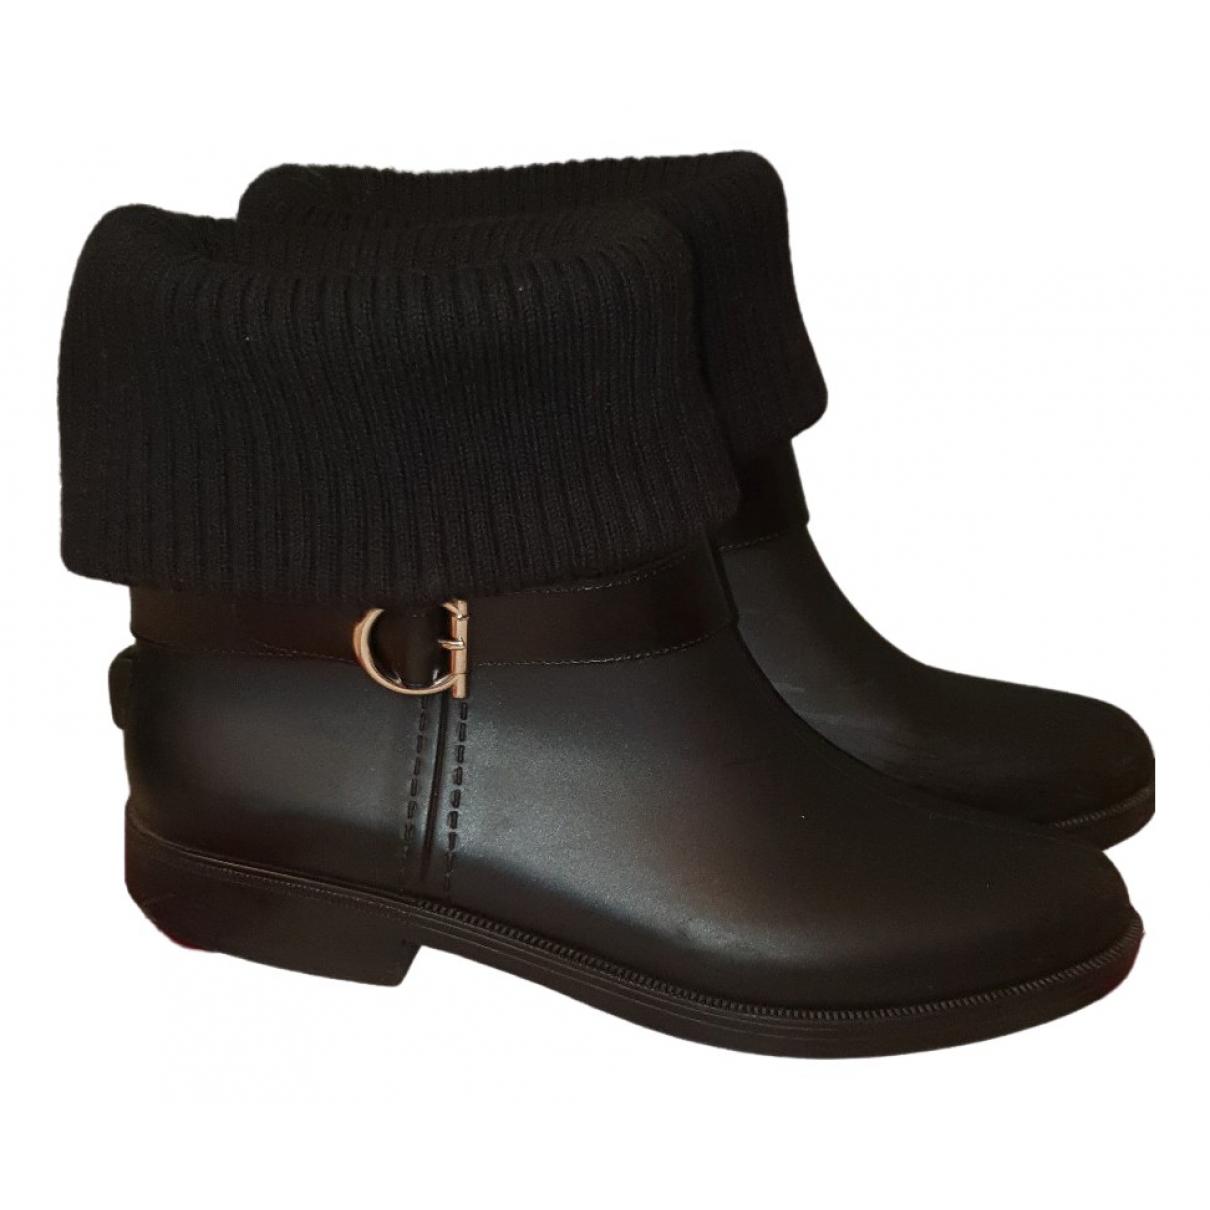 Salvatore Ferragamo \N Black Rubber Ankle boots for Women 9 UK